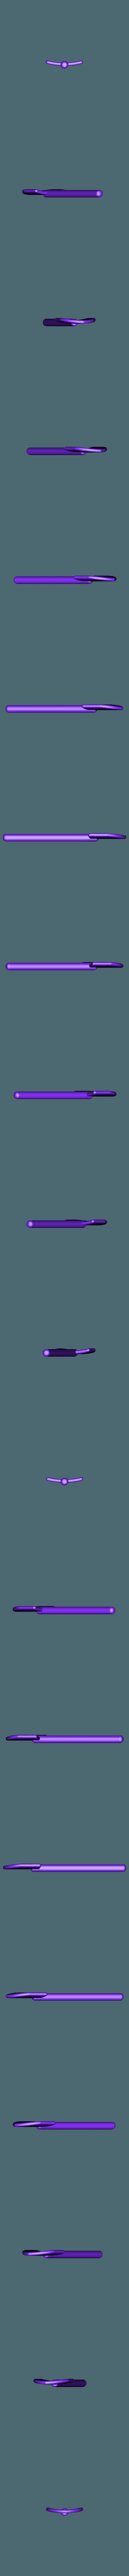 playmobil_shovel.stl Download free STL file Playmobil toolbox with tools • 3D printable template, sokinkeso